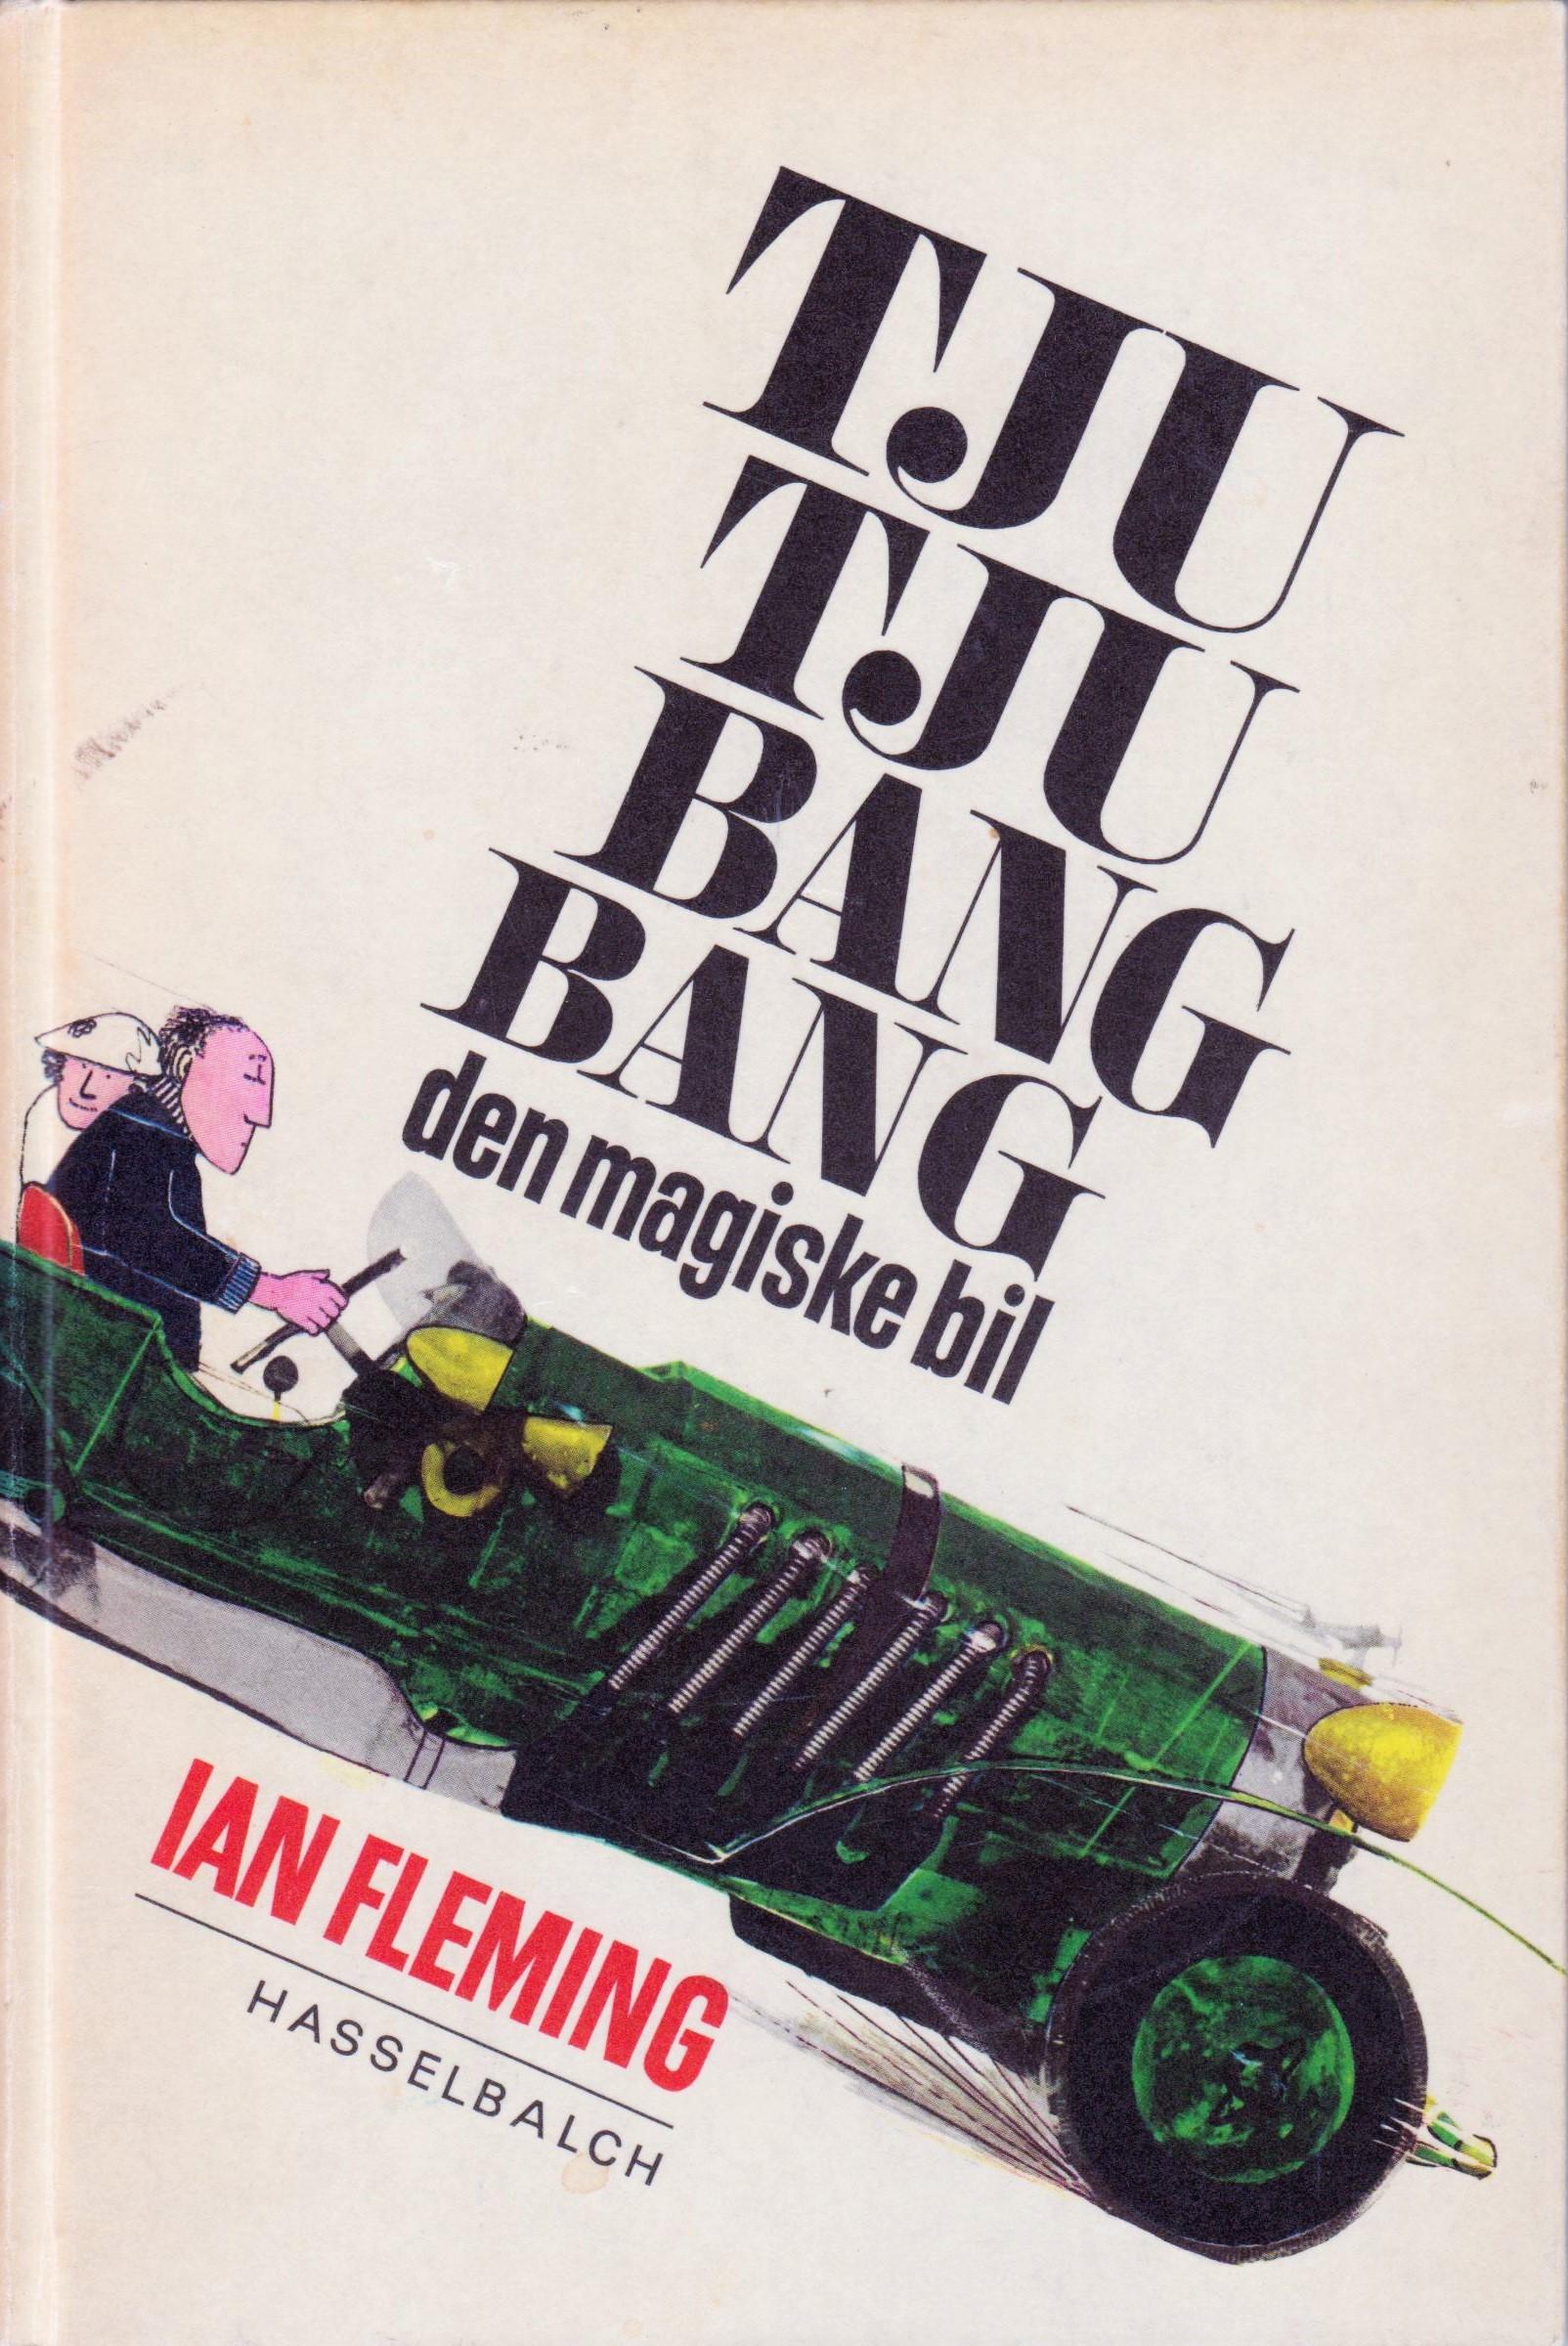 Tju-tju-bang-bang DK 1966 forside